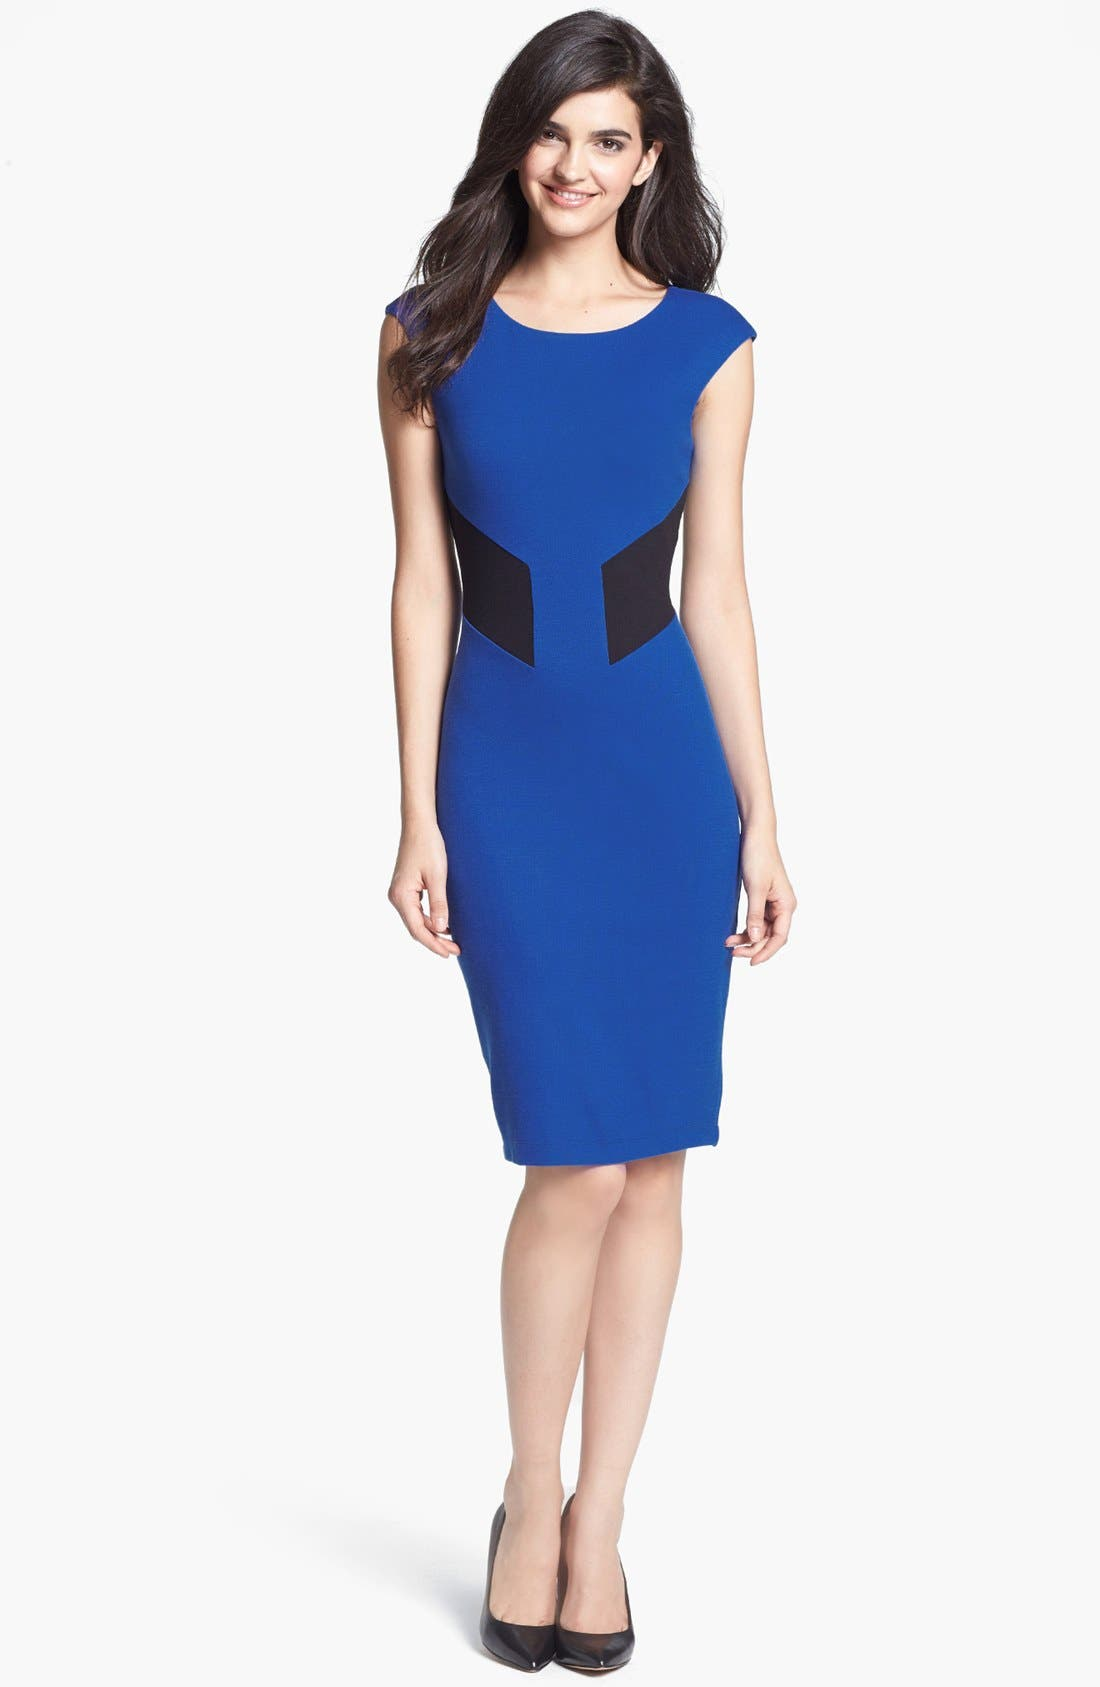 Main Image - B44 Dressed by Bailey 44 'Biotech' Back Cutout Colorblock Sheath Dress